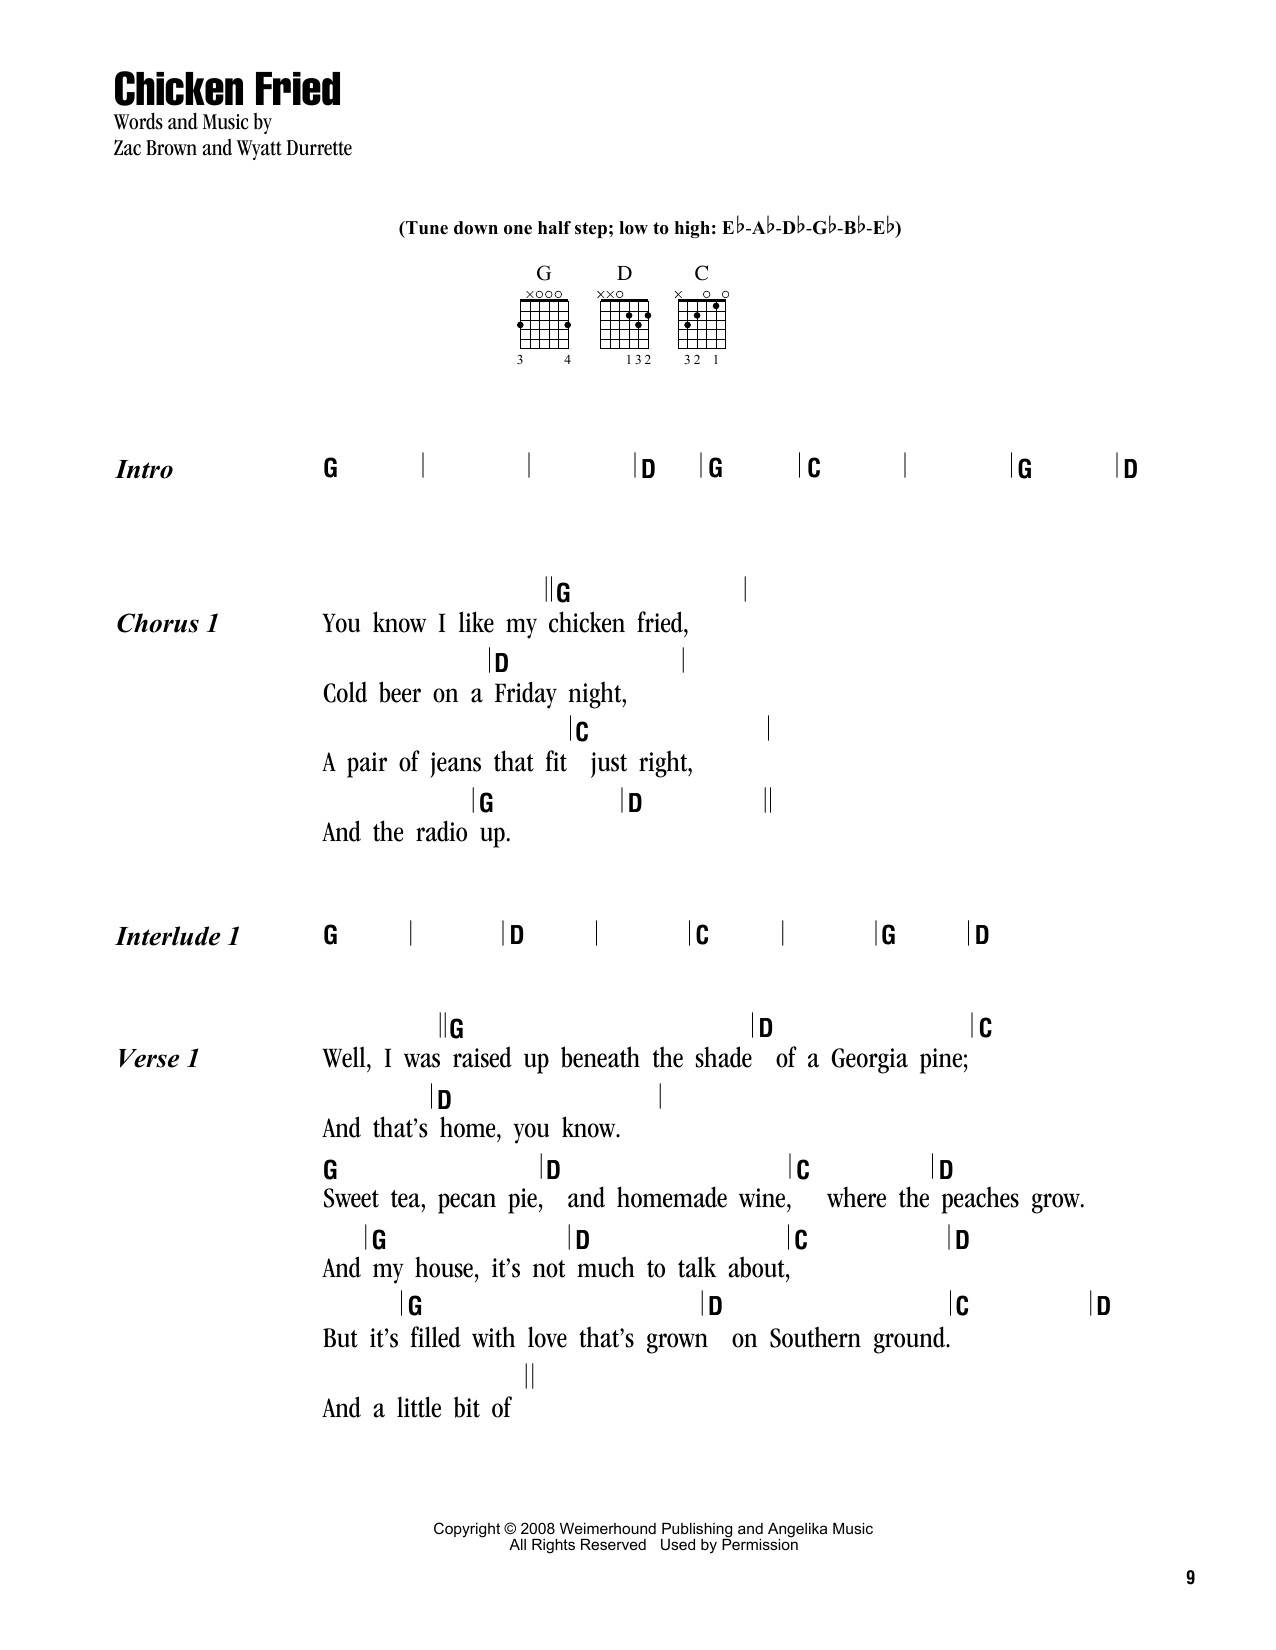 Chicken Fried Chords  Chicken Fried sheet music by Zac Brown Band Lyrics